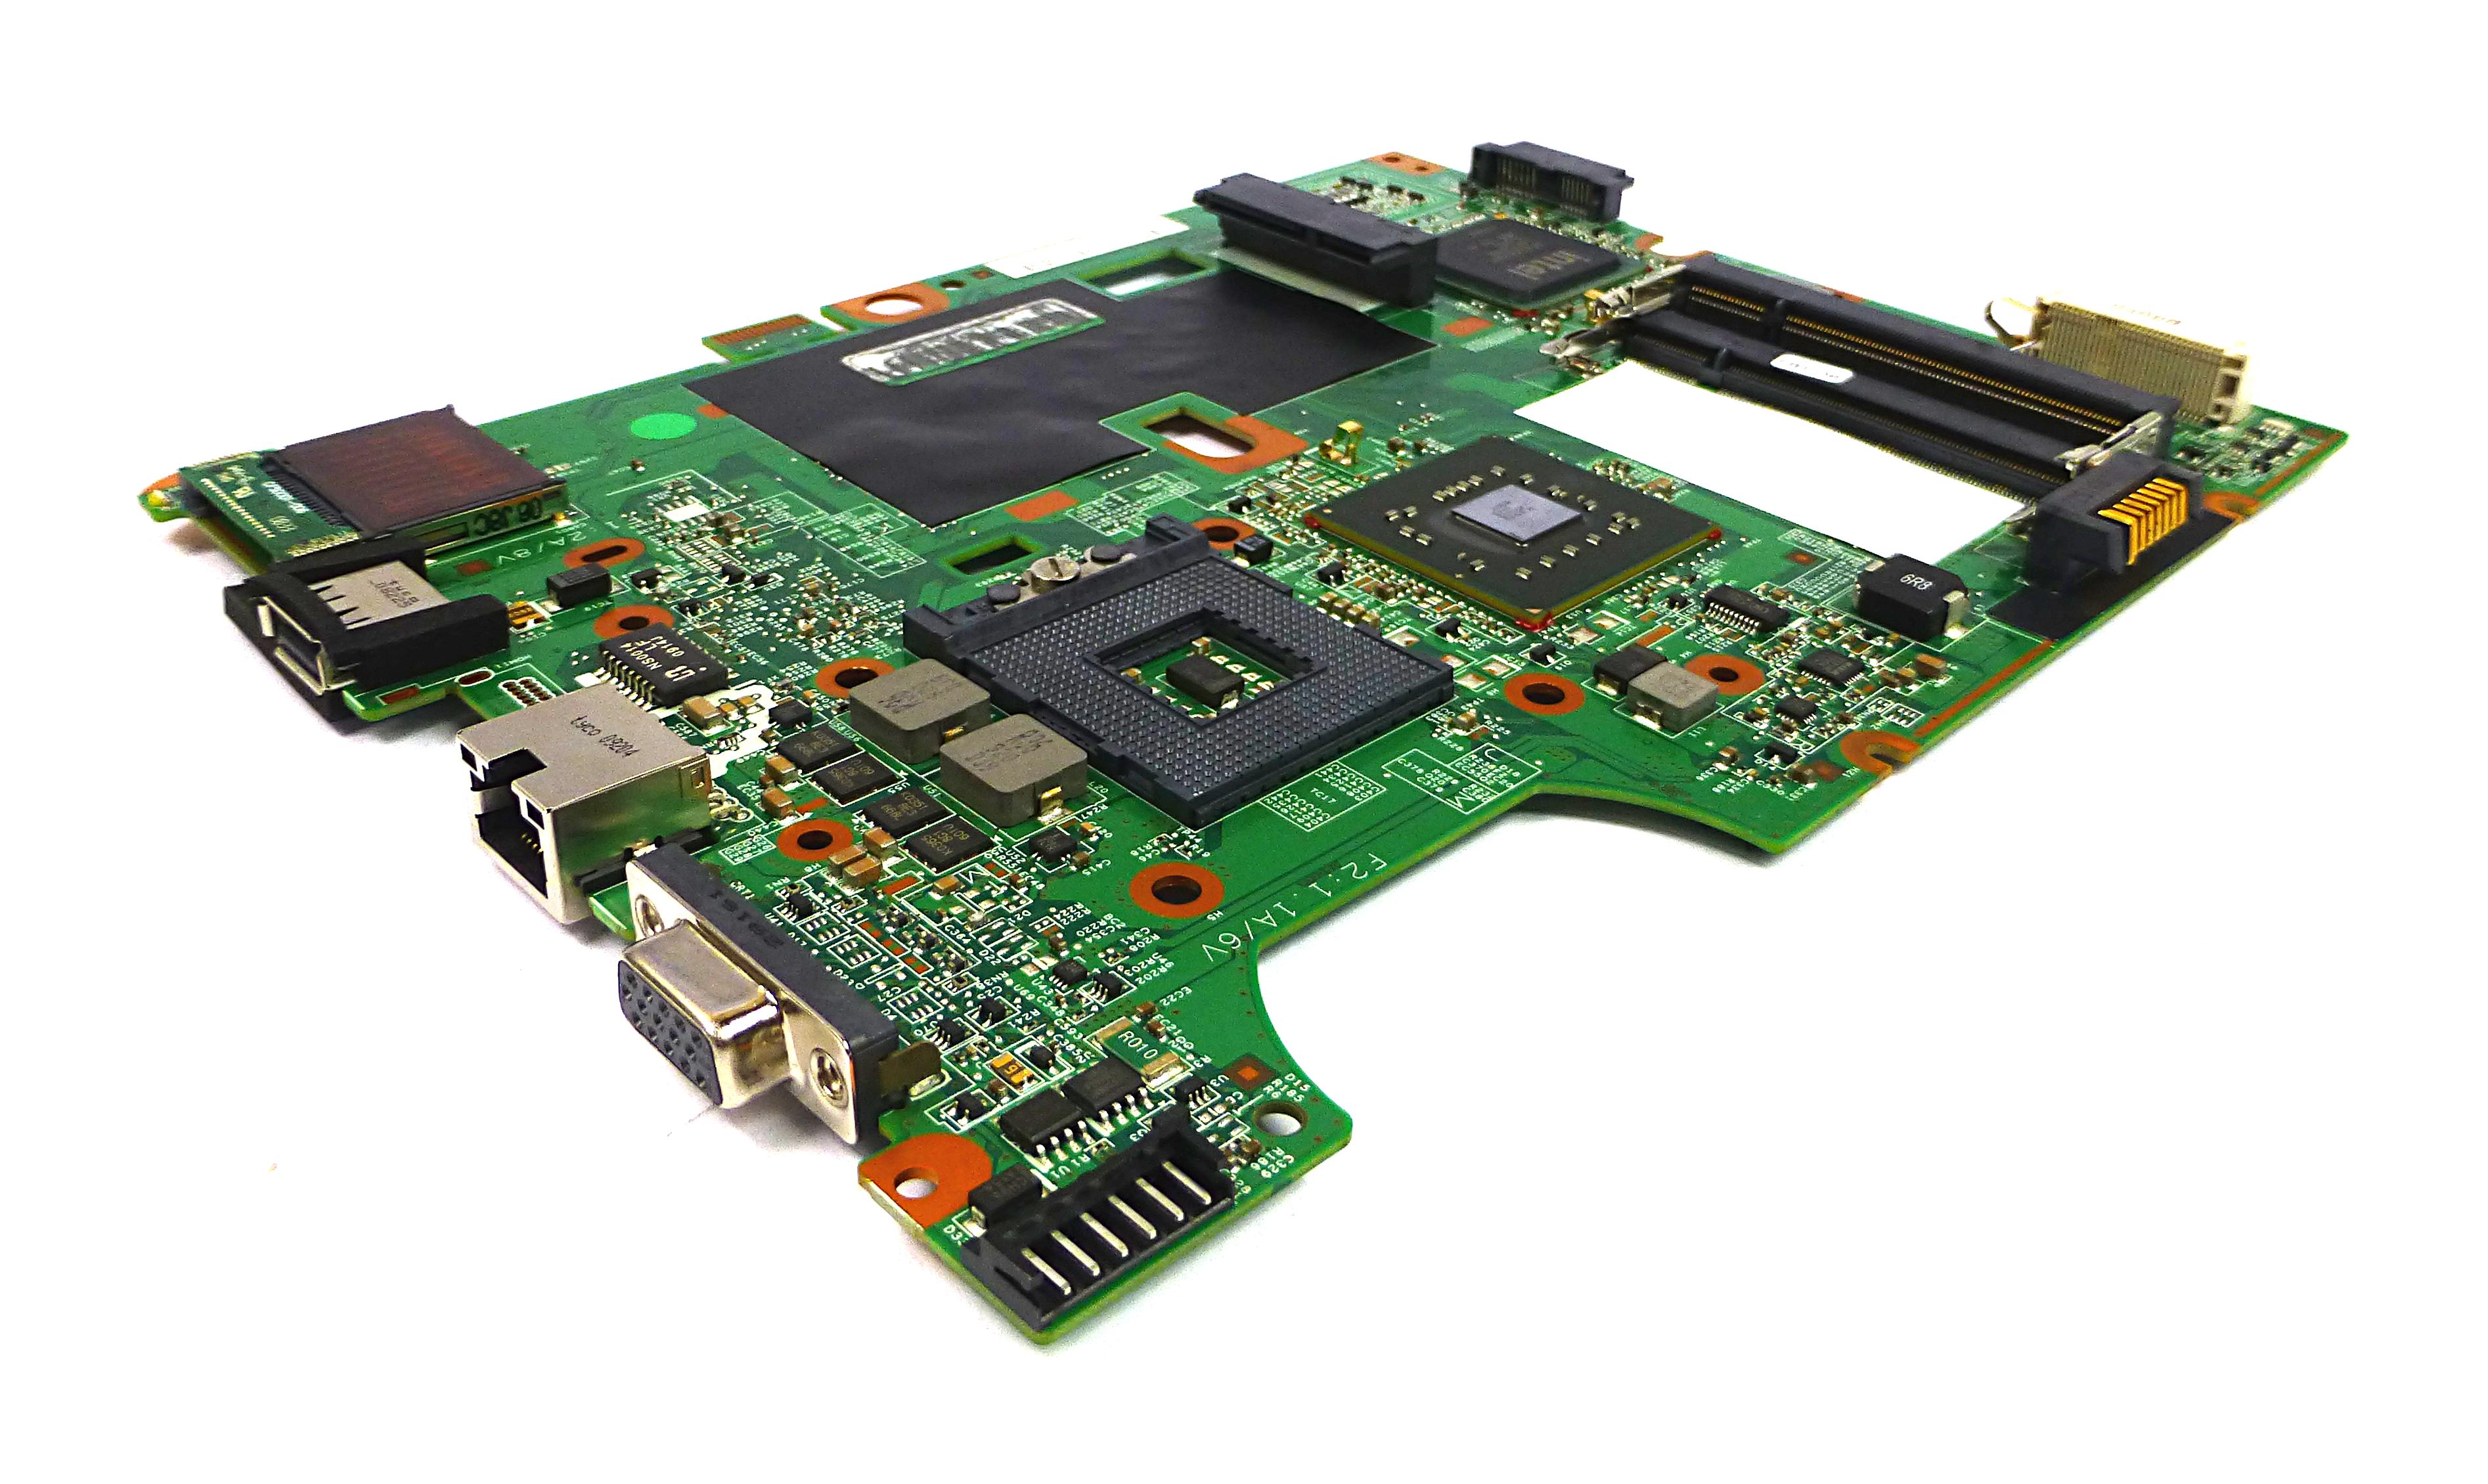 HP 494282-001 Socket 479 Laptop Motherboard - 48.4H501.021